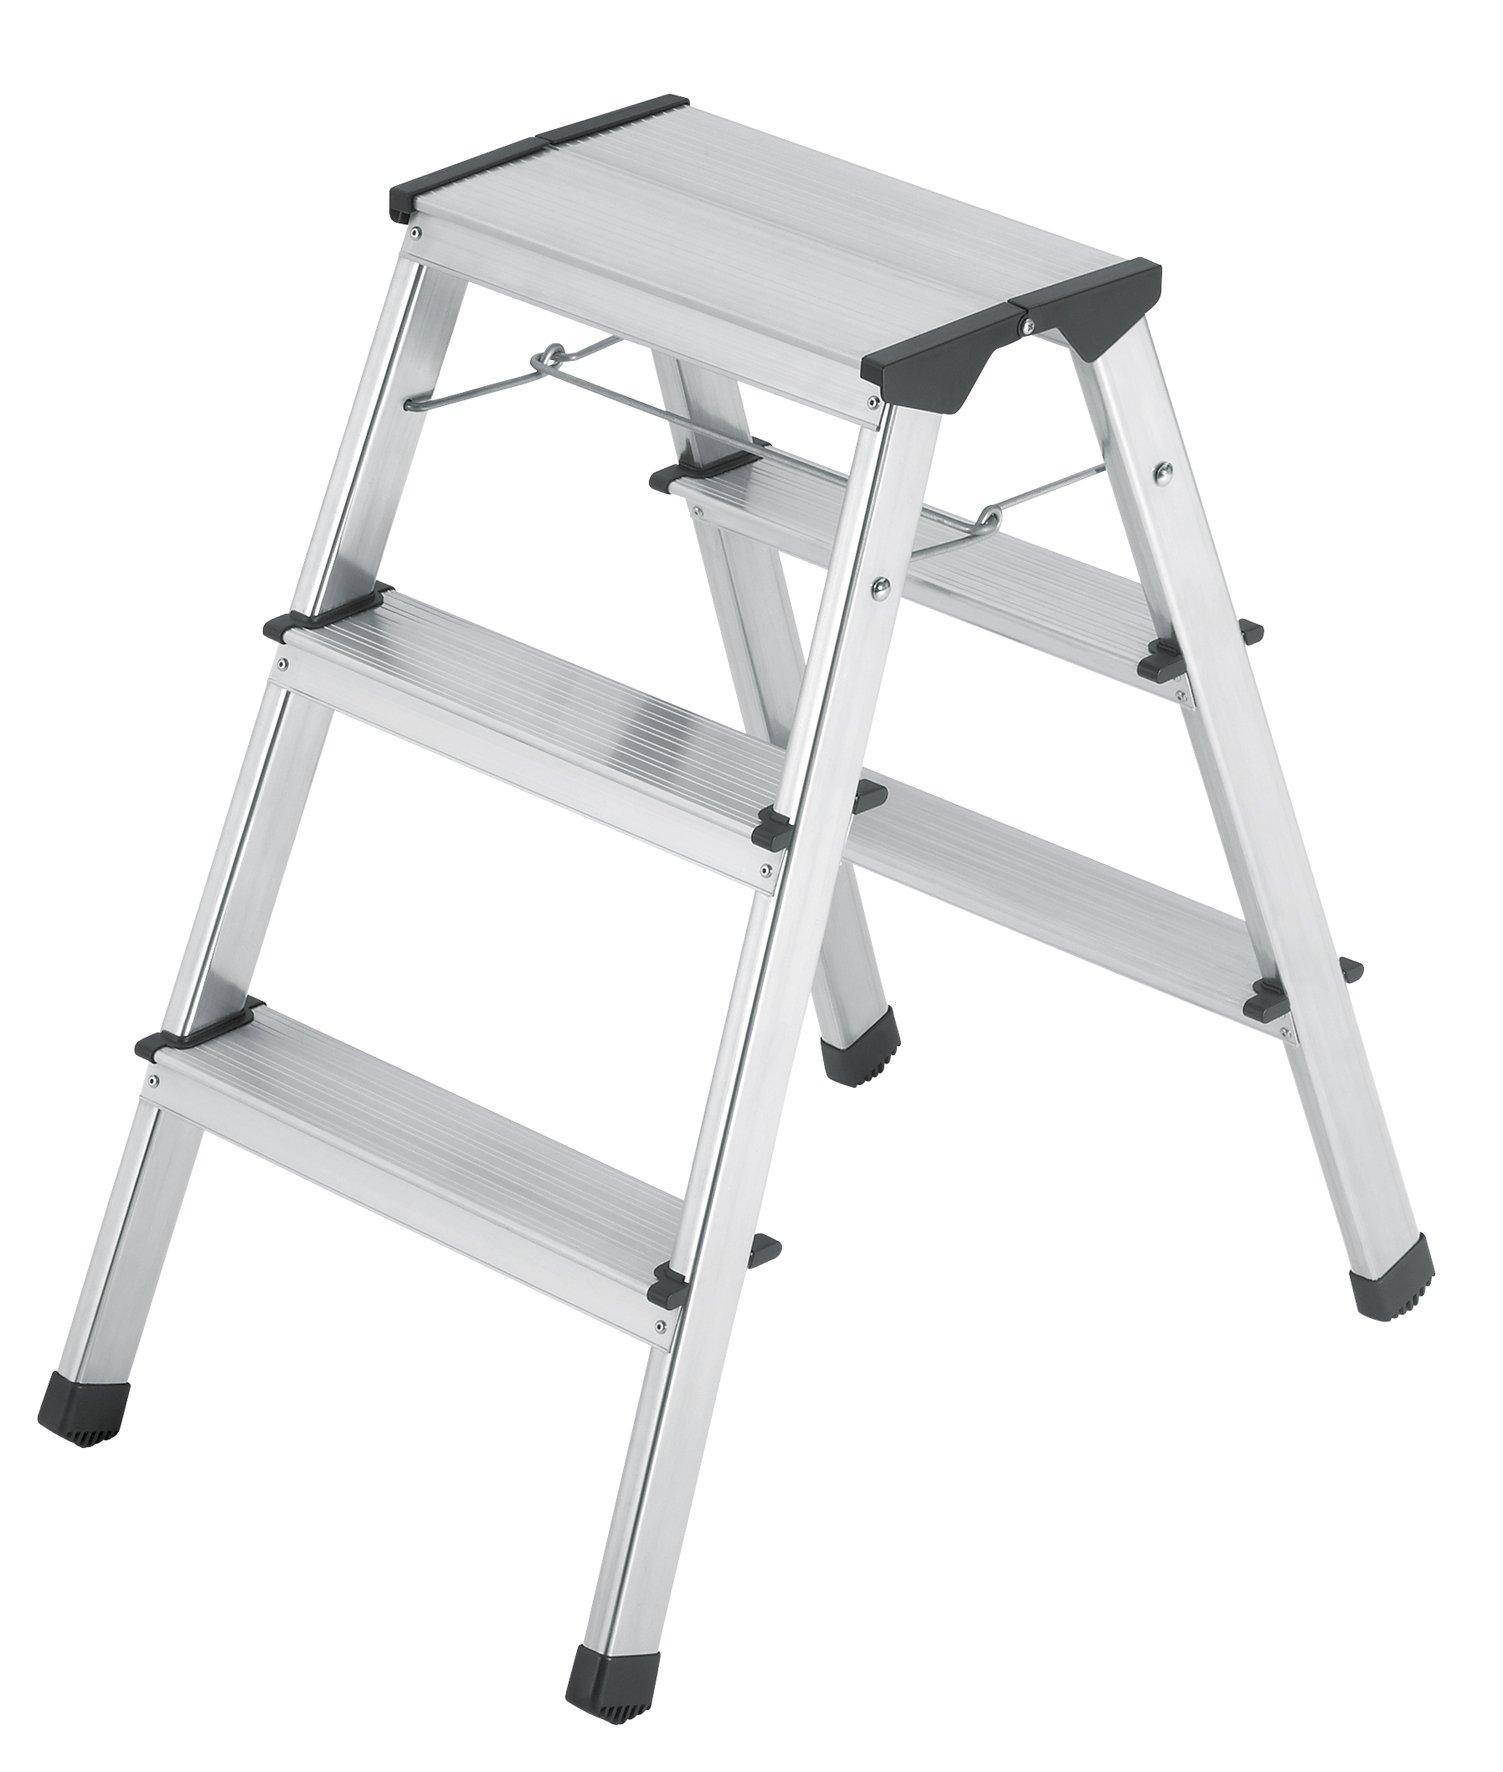 Hailo 8643-001 Stepke-Model 330-Pound Capacity Aluminum Step Stool, 3-Step